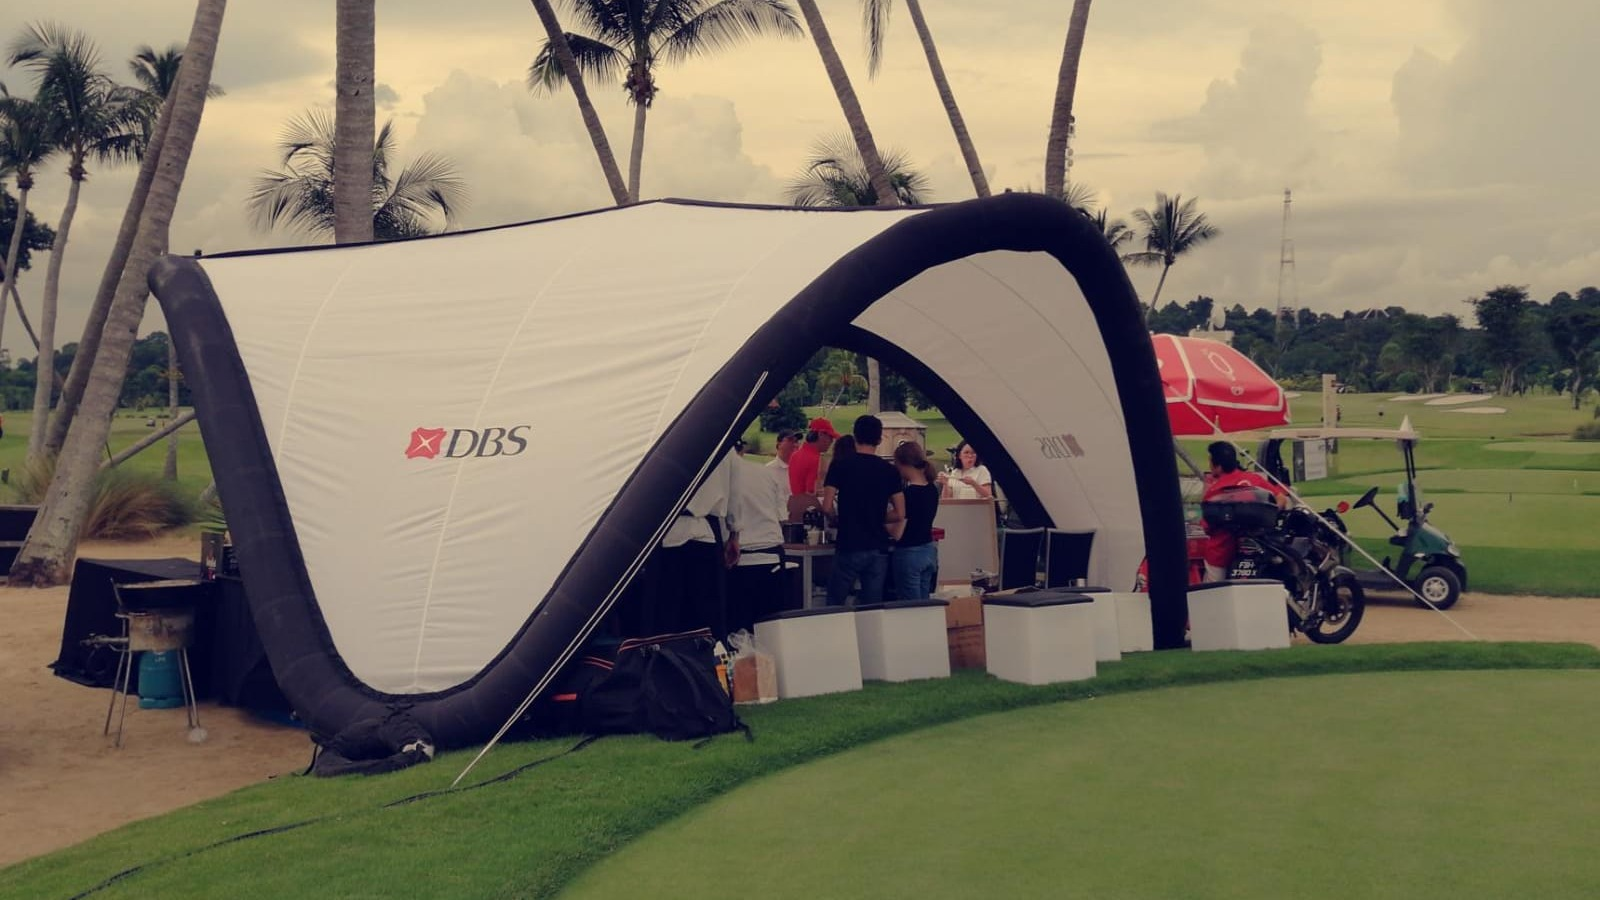 #Branding #Inflatable #Tent